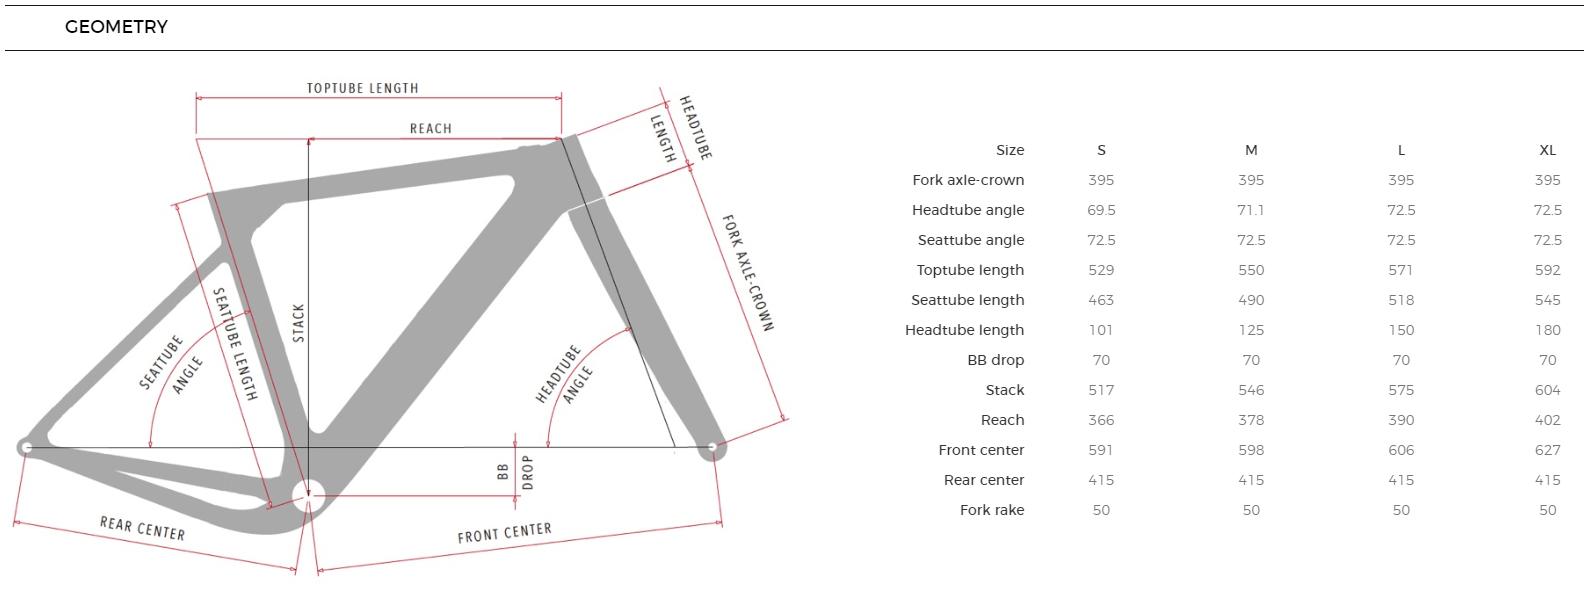 3T Exploro geometry chart